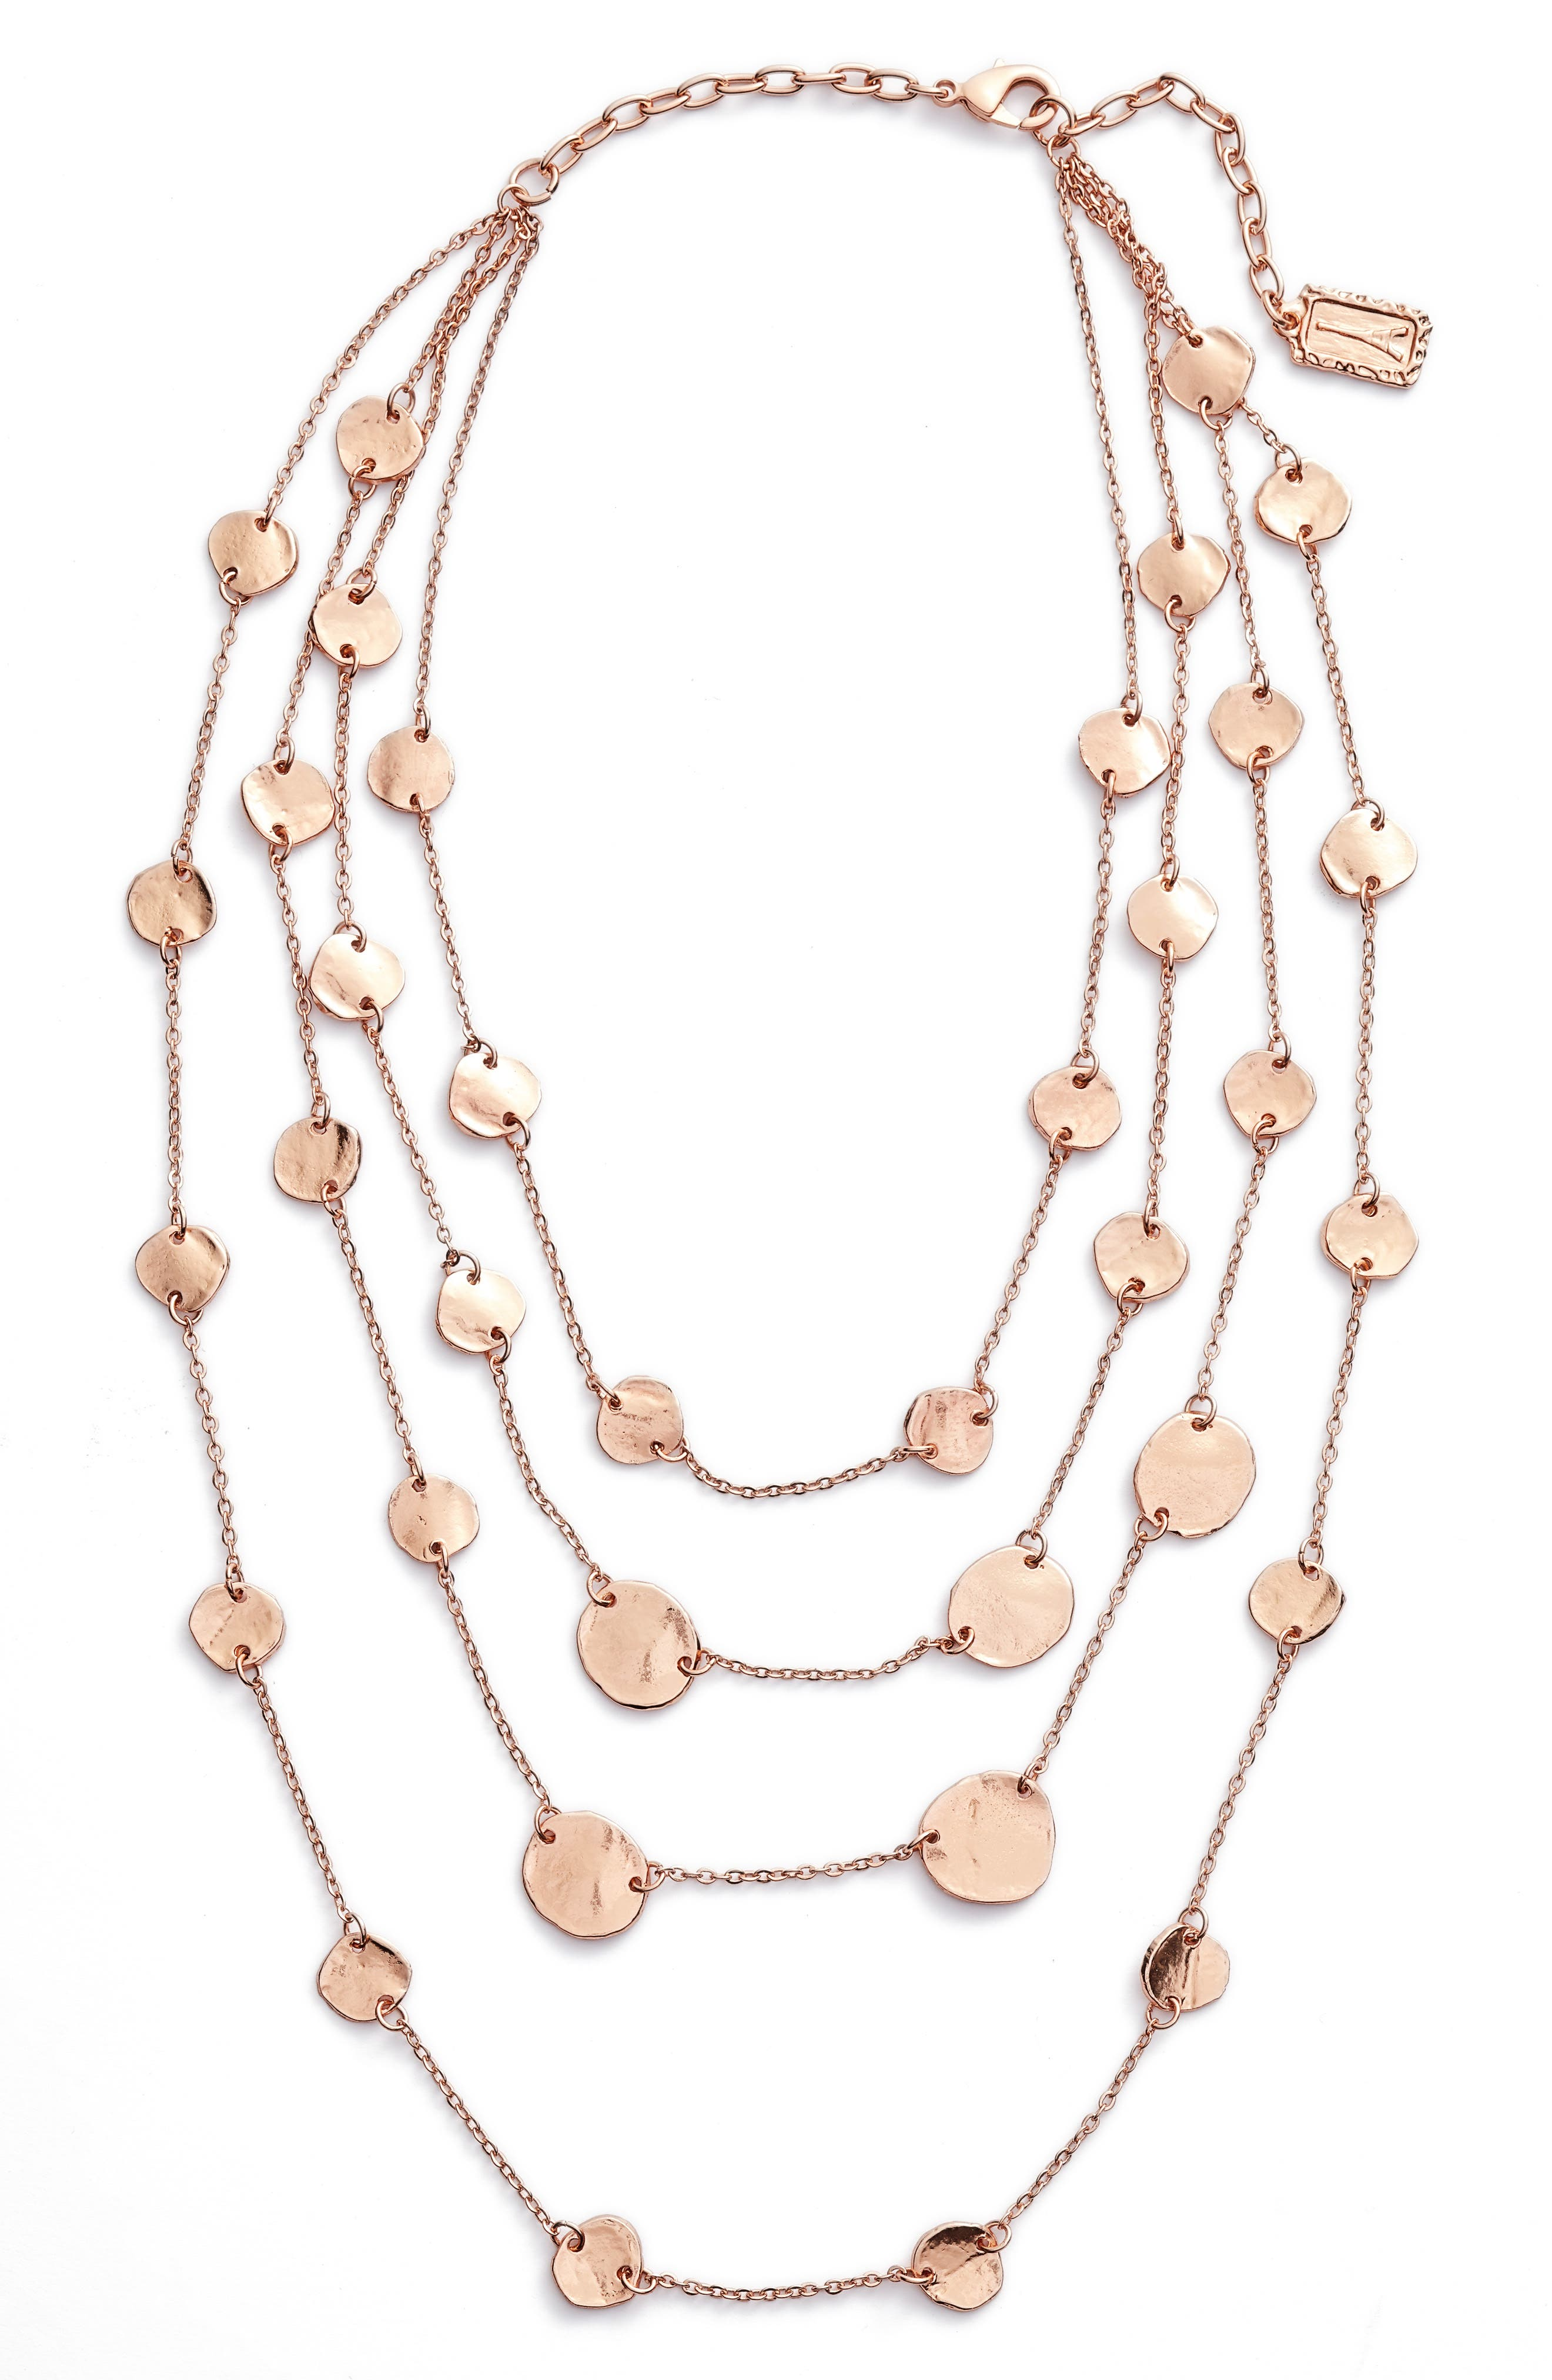 Karine Sultan Manon Layered Necklace